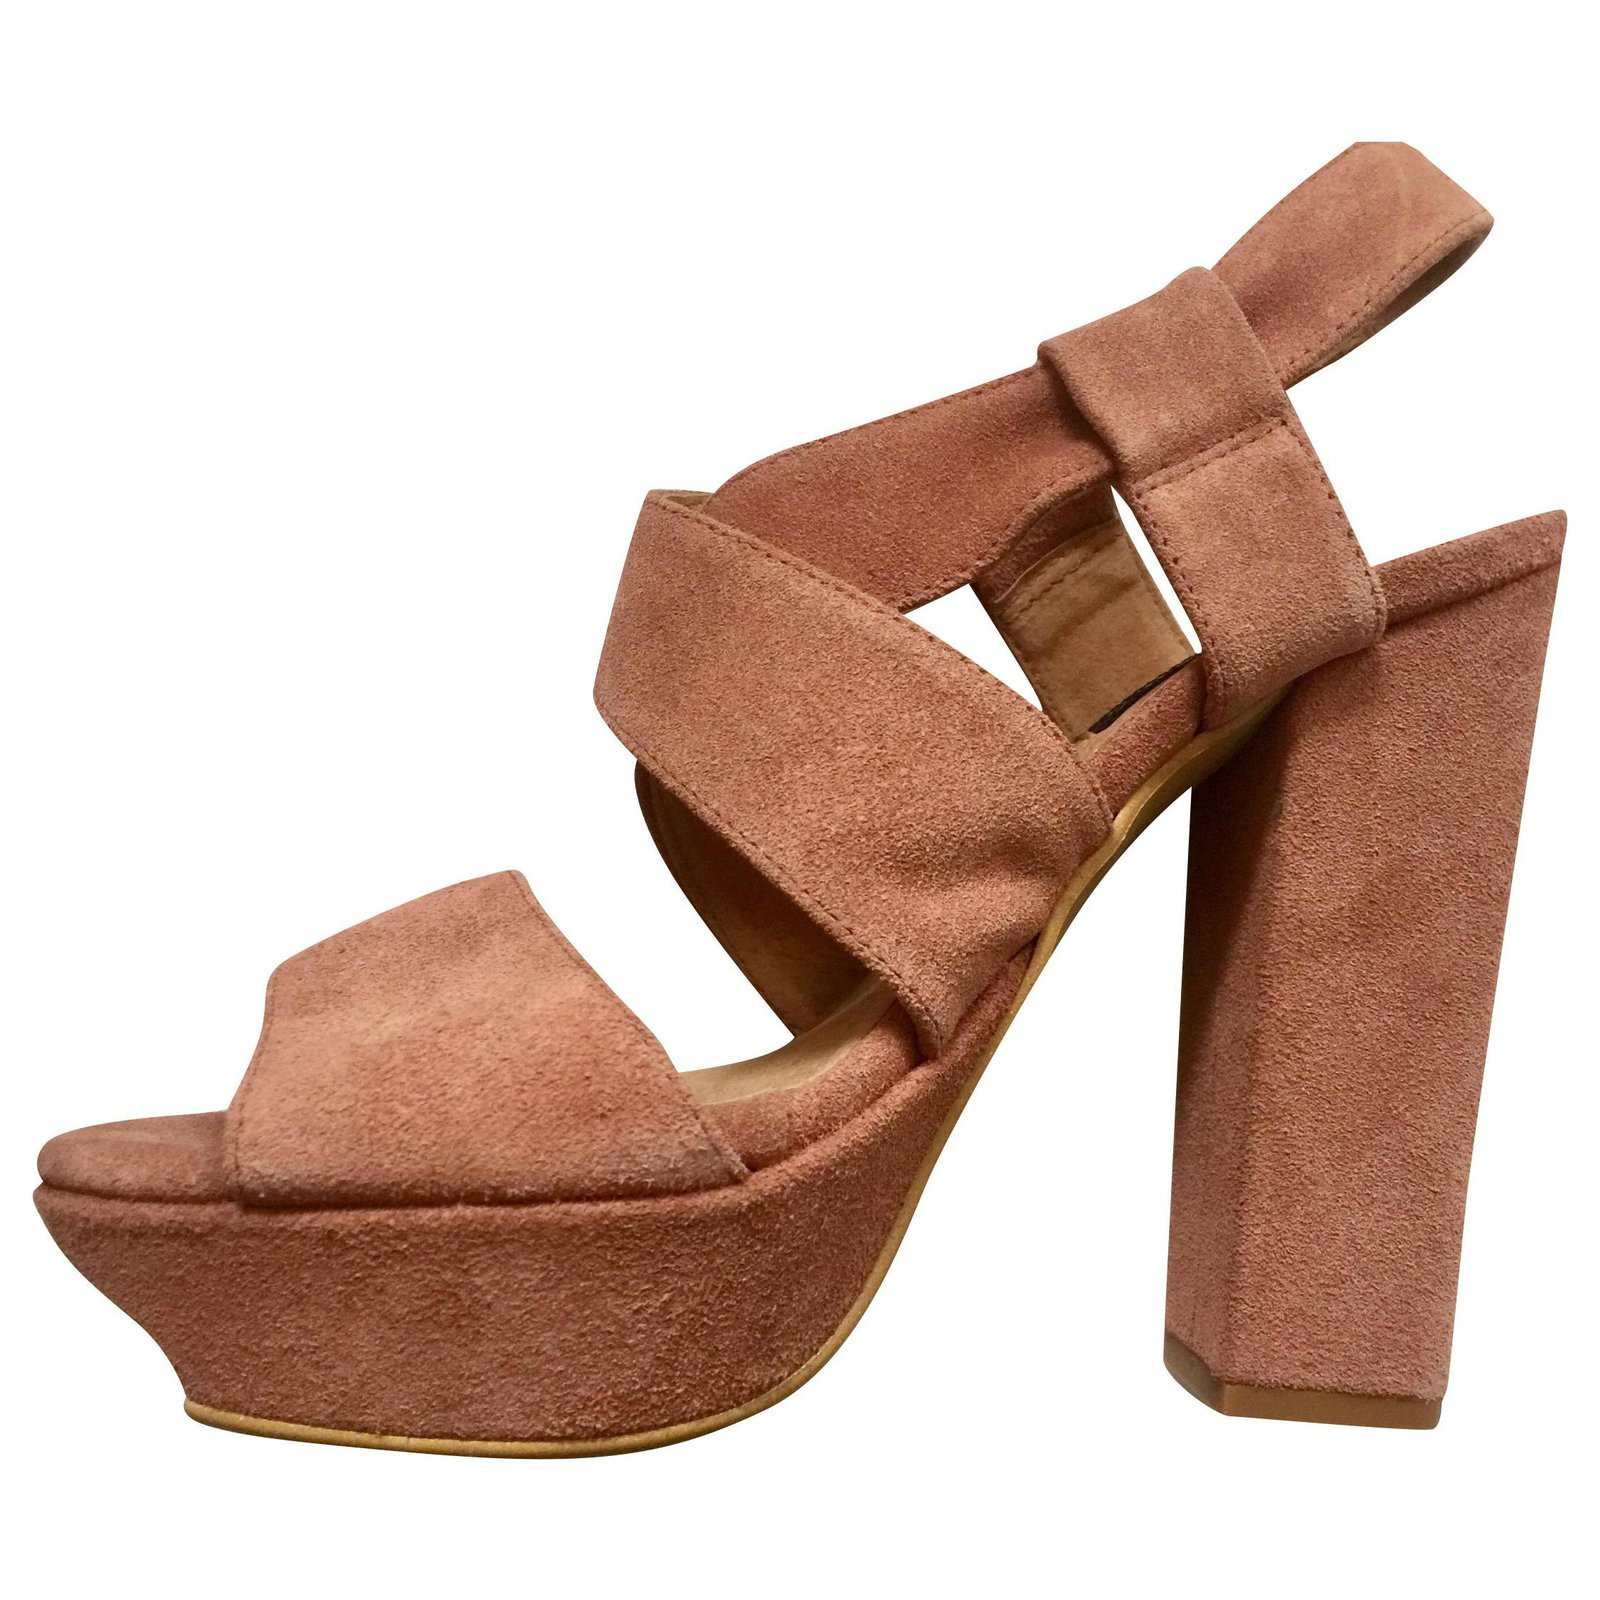 Hobbs Platform heels in dusky pink